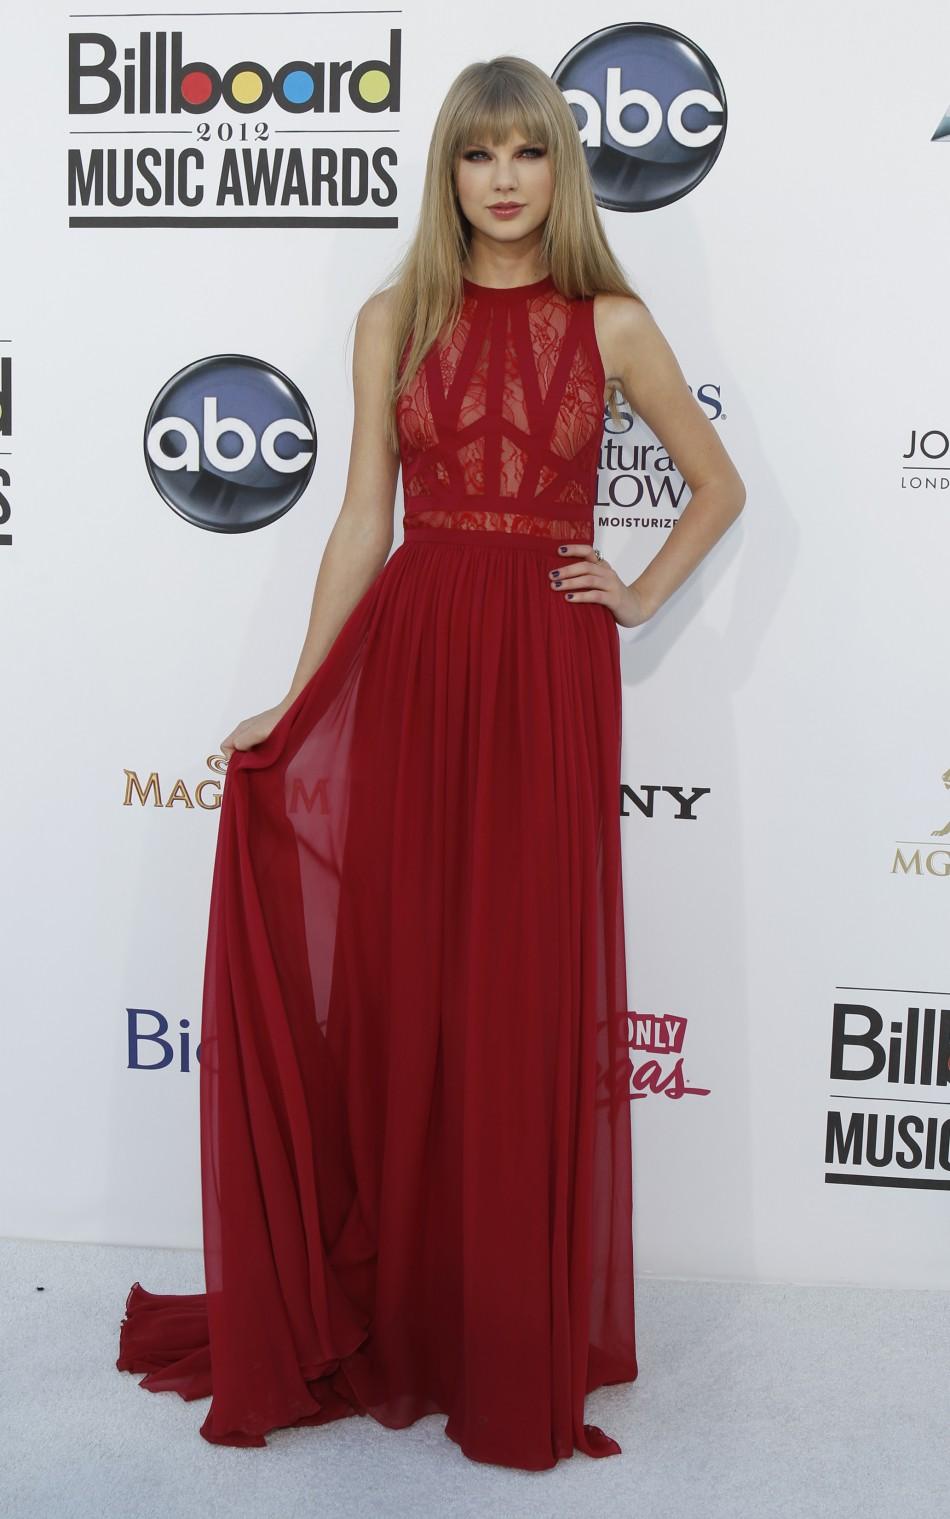 Singer Taylor Swift arrives at the 2012 Billboard Music Awards in Las Vegas